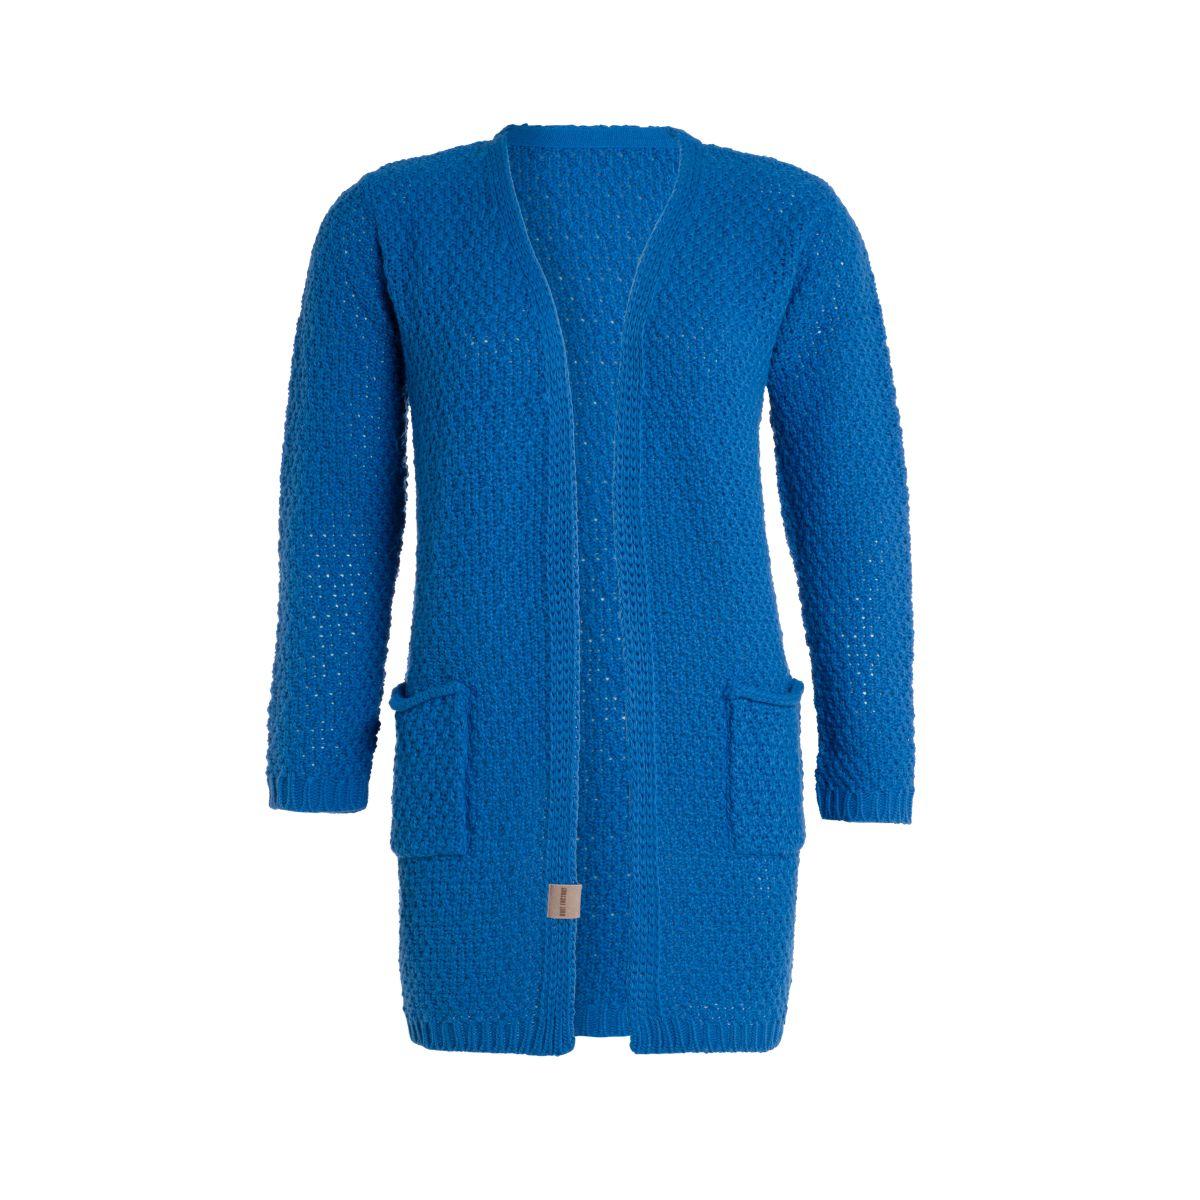 luna knitted cardigan cobalt 4042 with side pockets